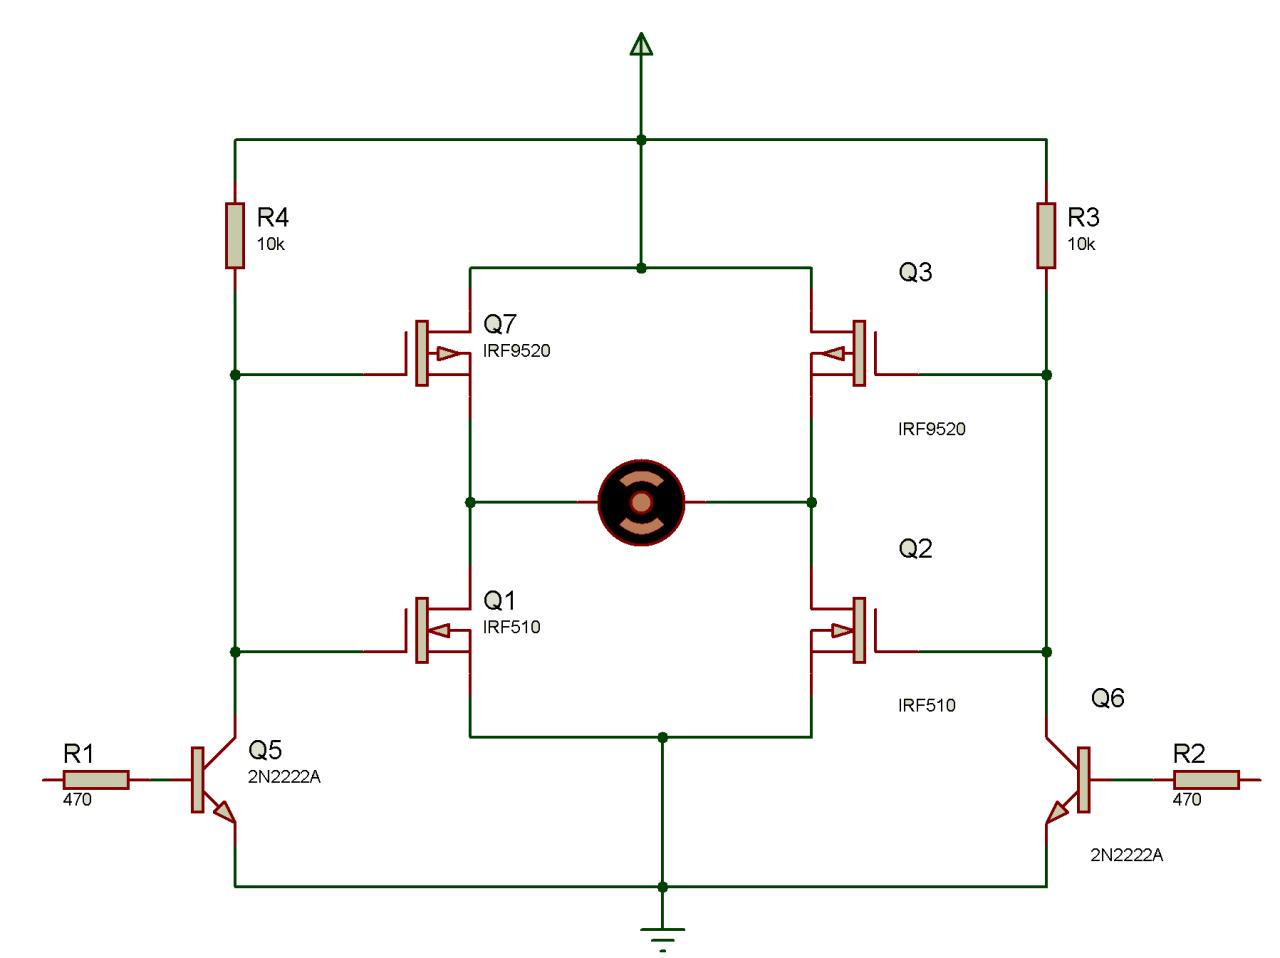 dc motor operated valve diagram [ 1280 x 958 Pixel ]